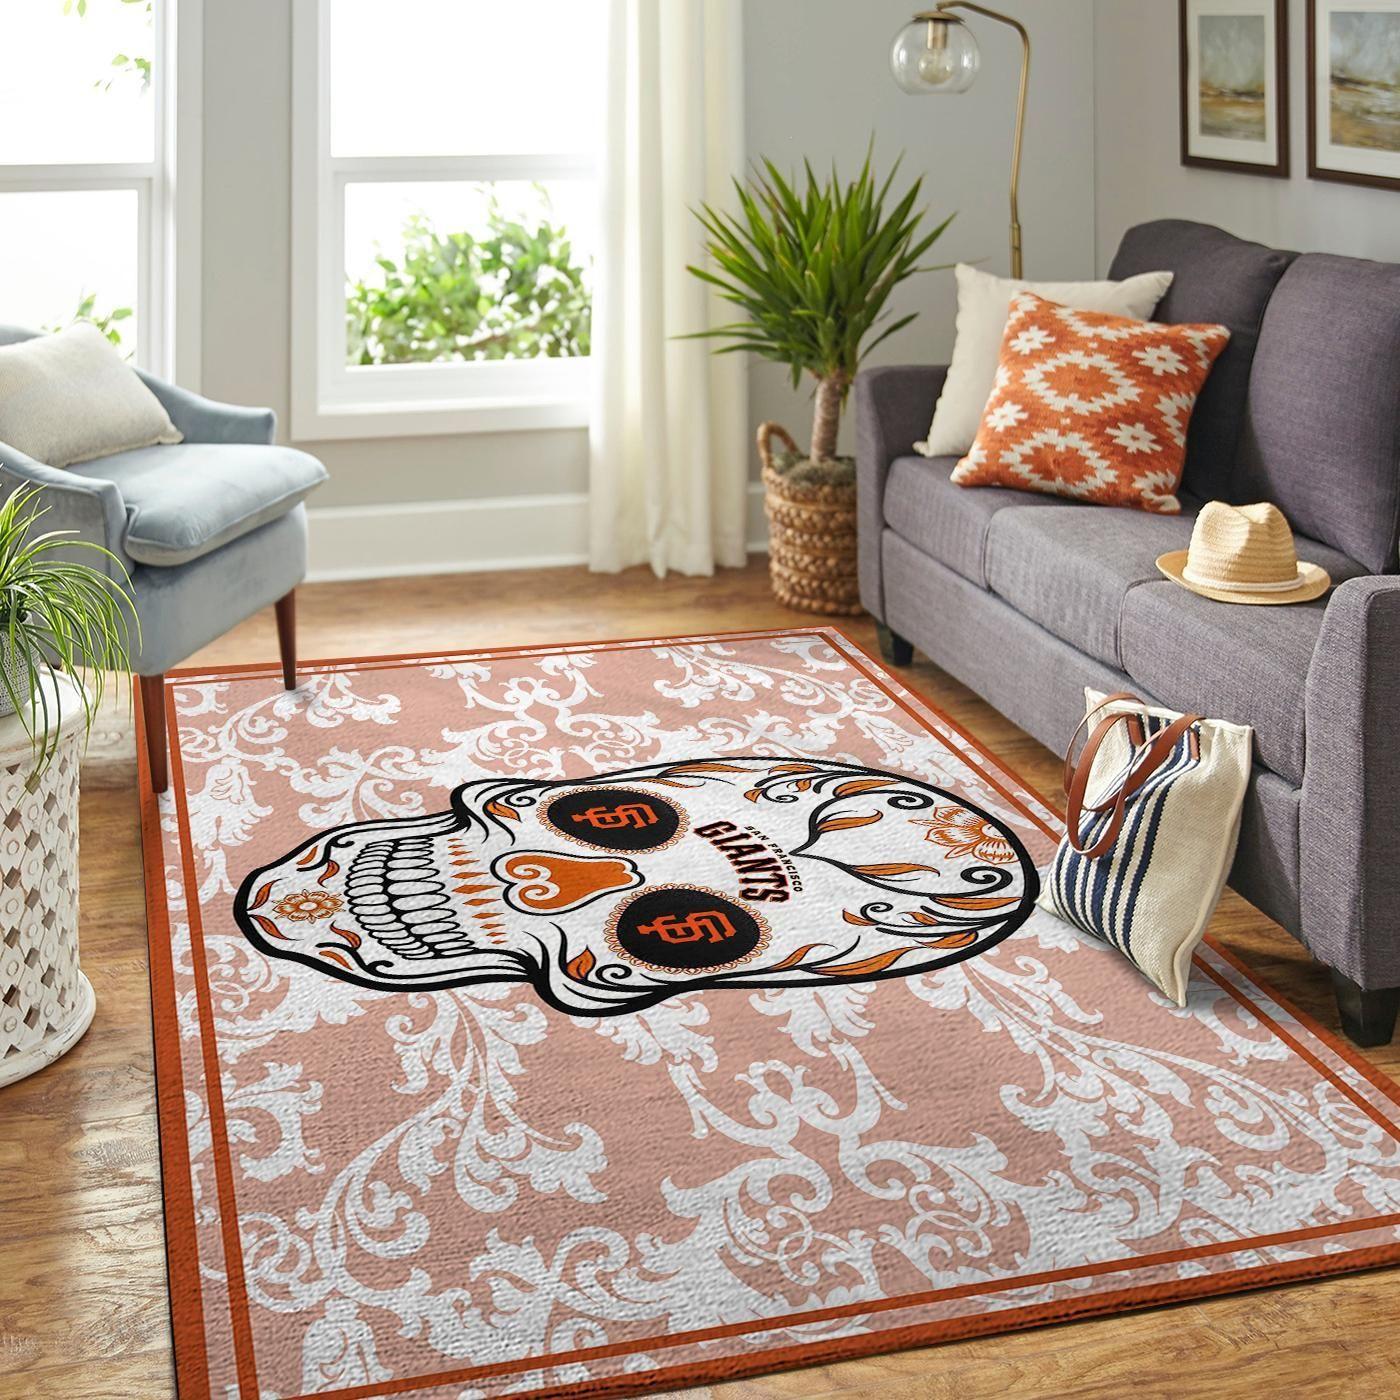 Amazon San Francisco Giants Living Room Area No4902 Rug